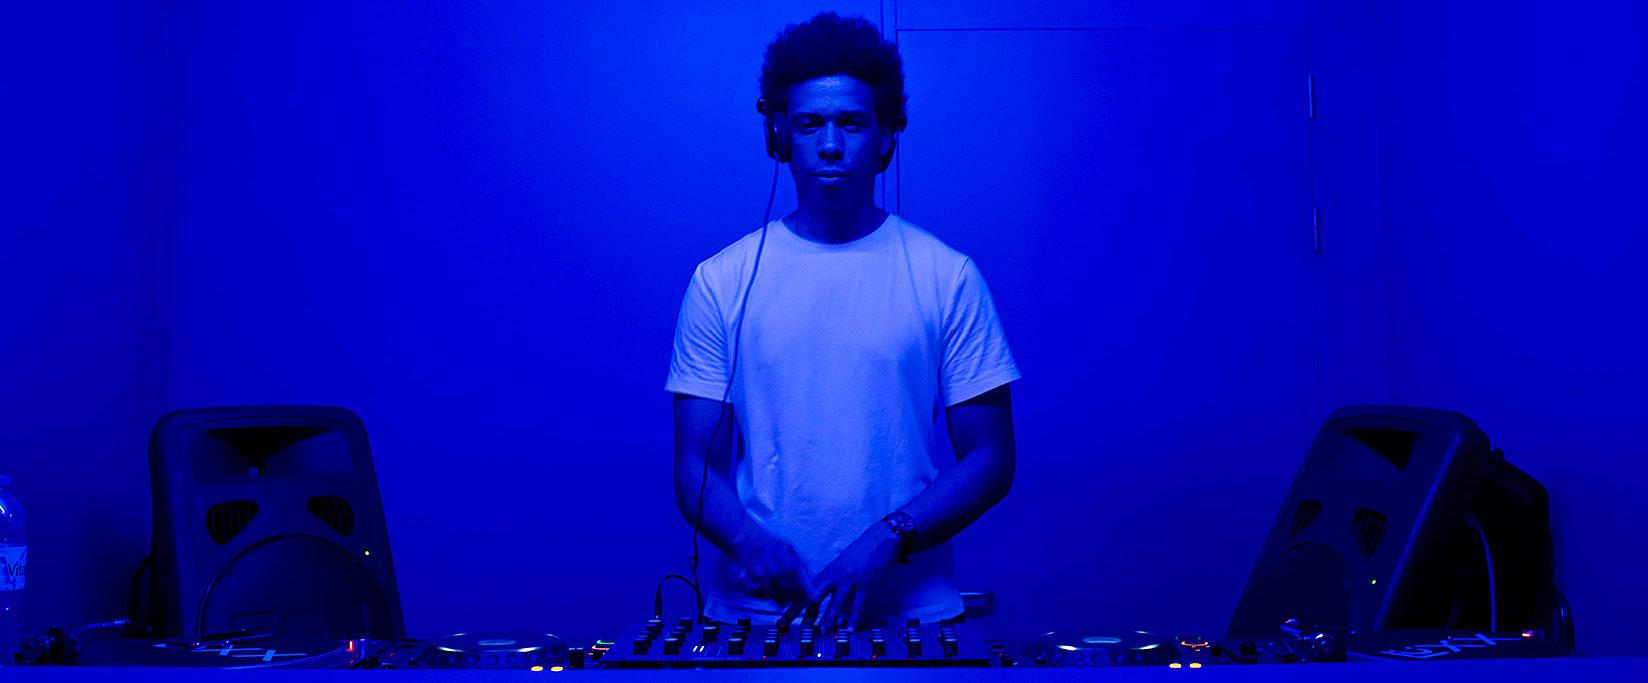 DJ at LUX Lisbon